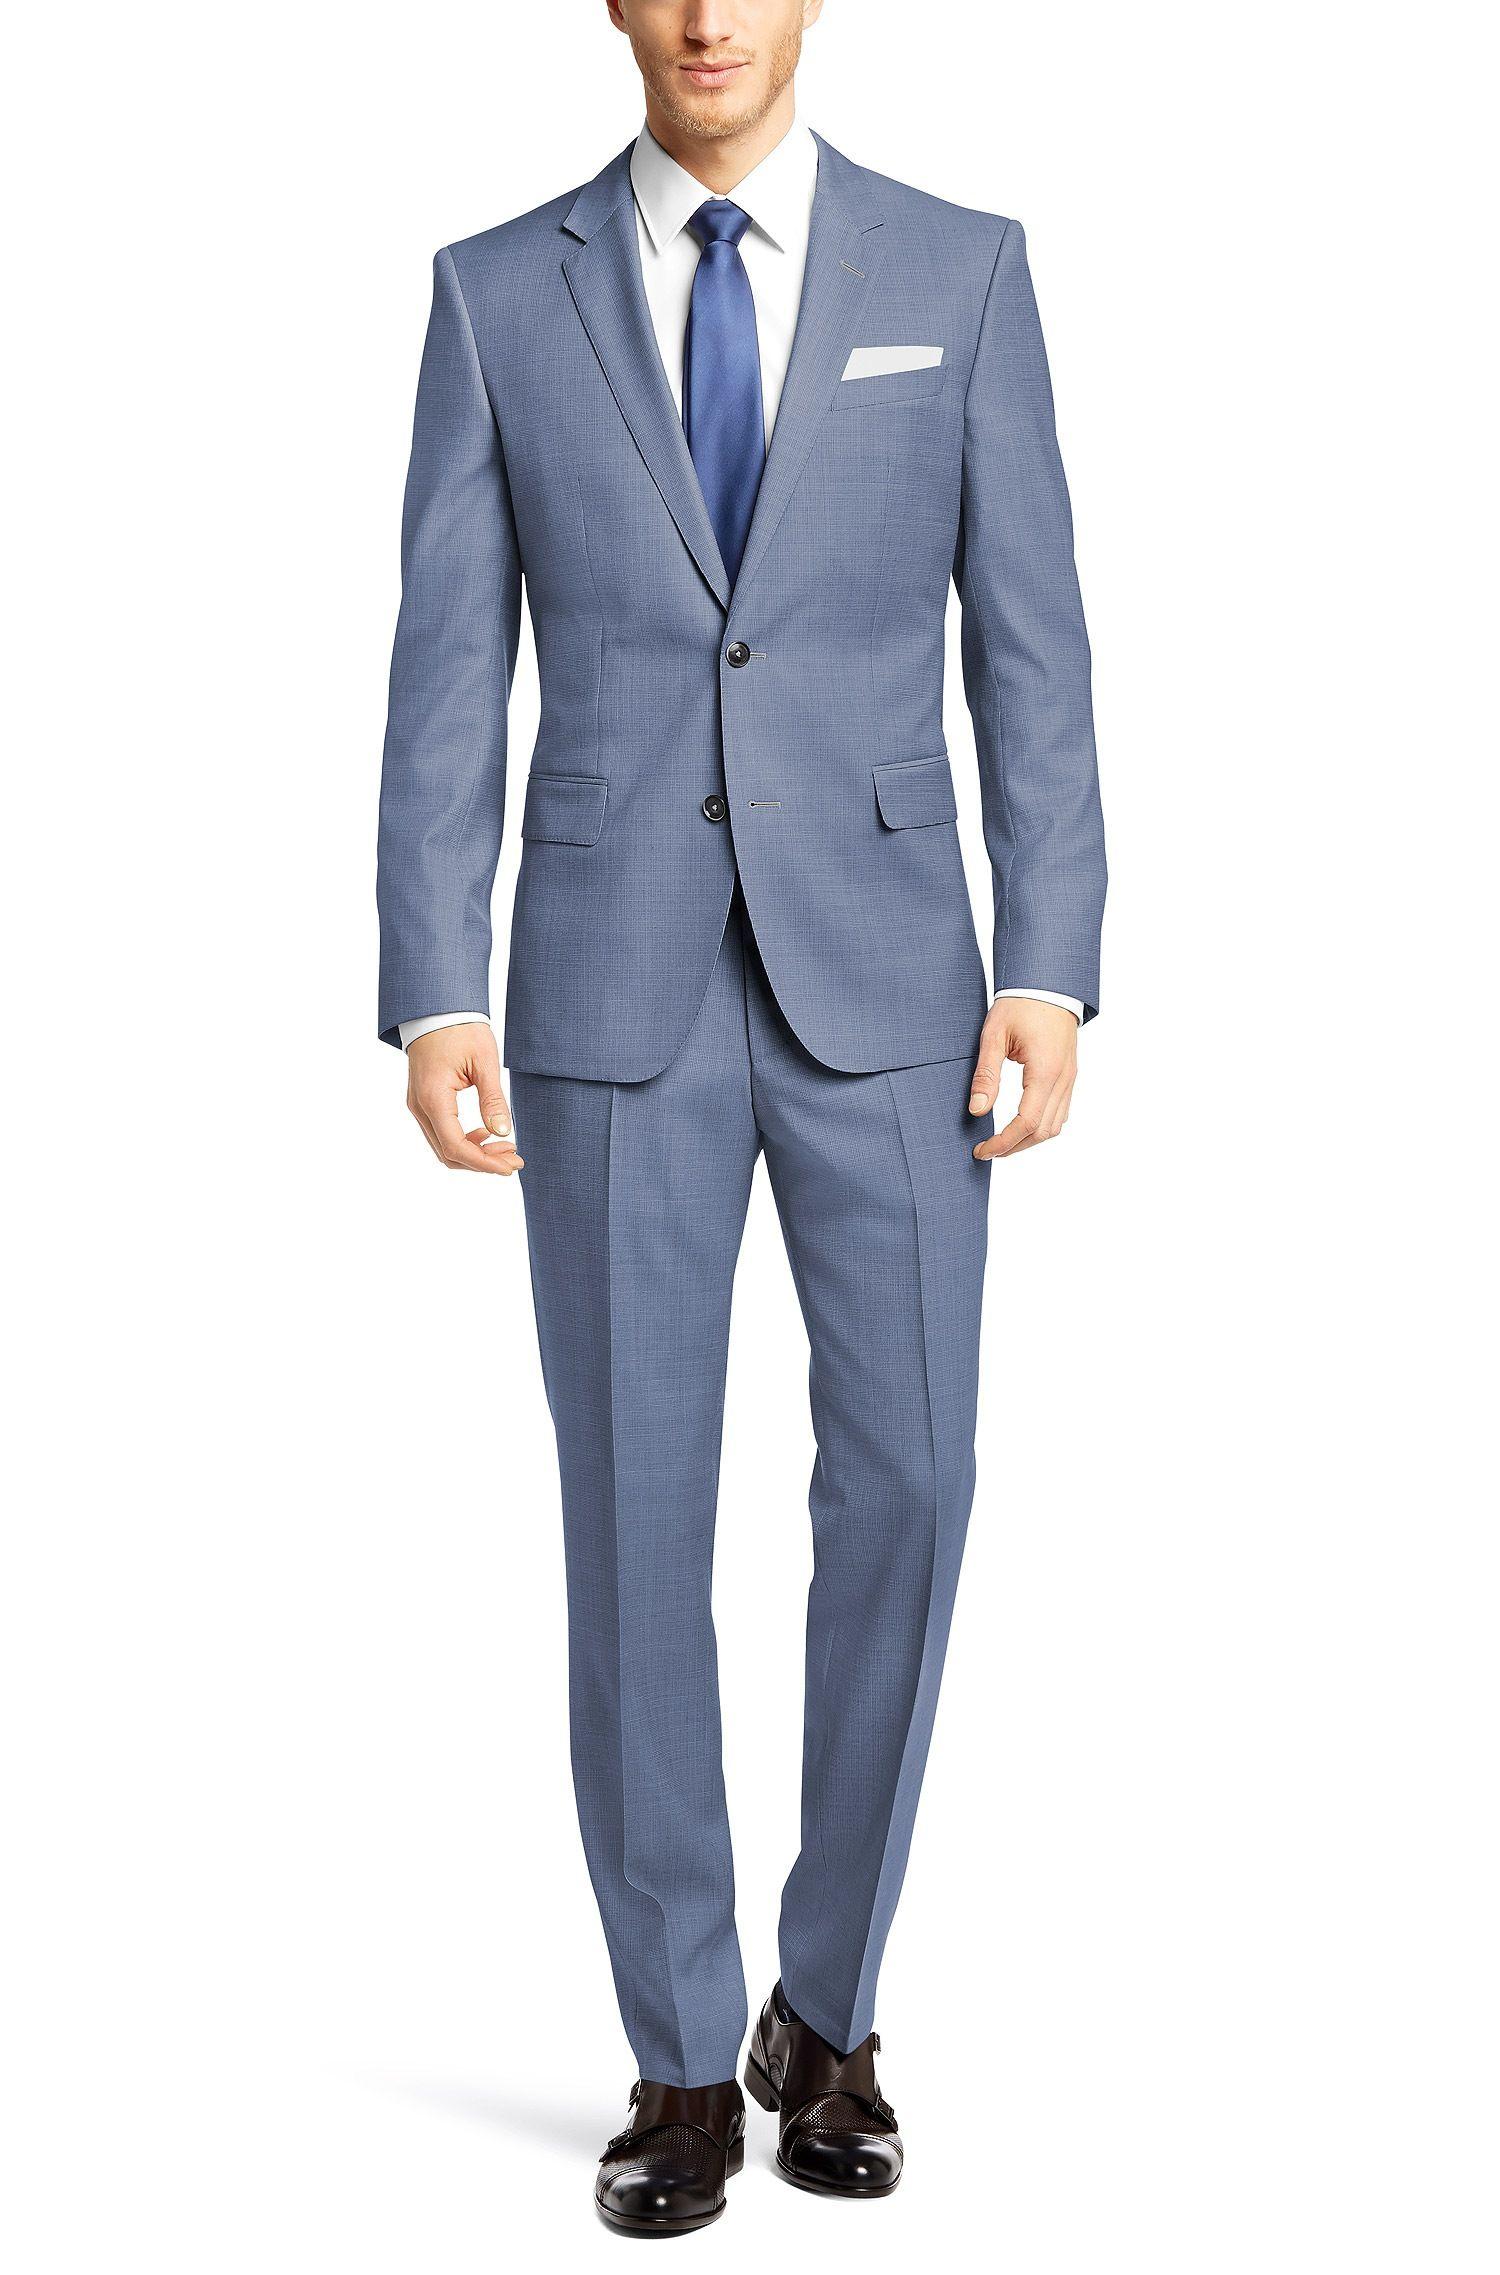 8f77a808c BOSS 'Hutson/Gander' | Slim Fit, Super 100 Italian Virgin Wool Suit Light  Blue free shipping